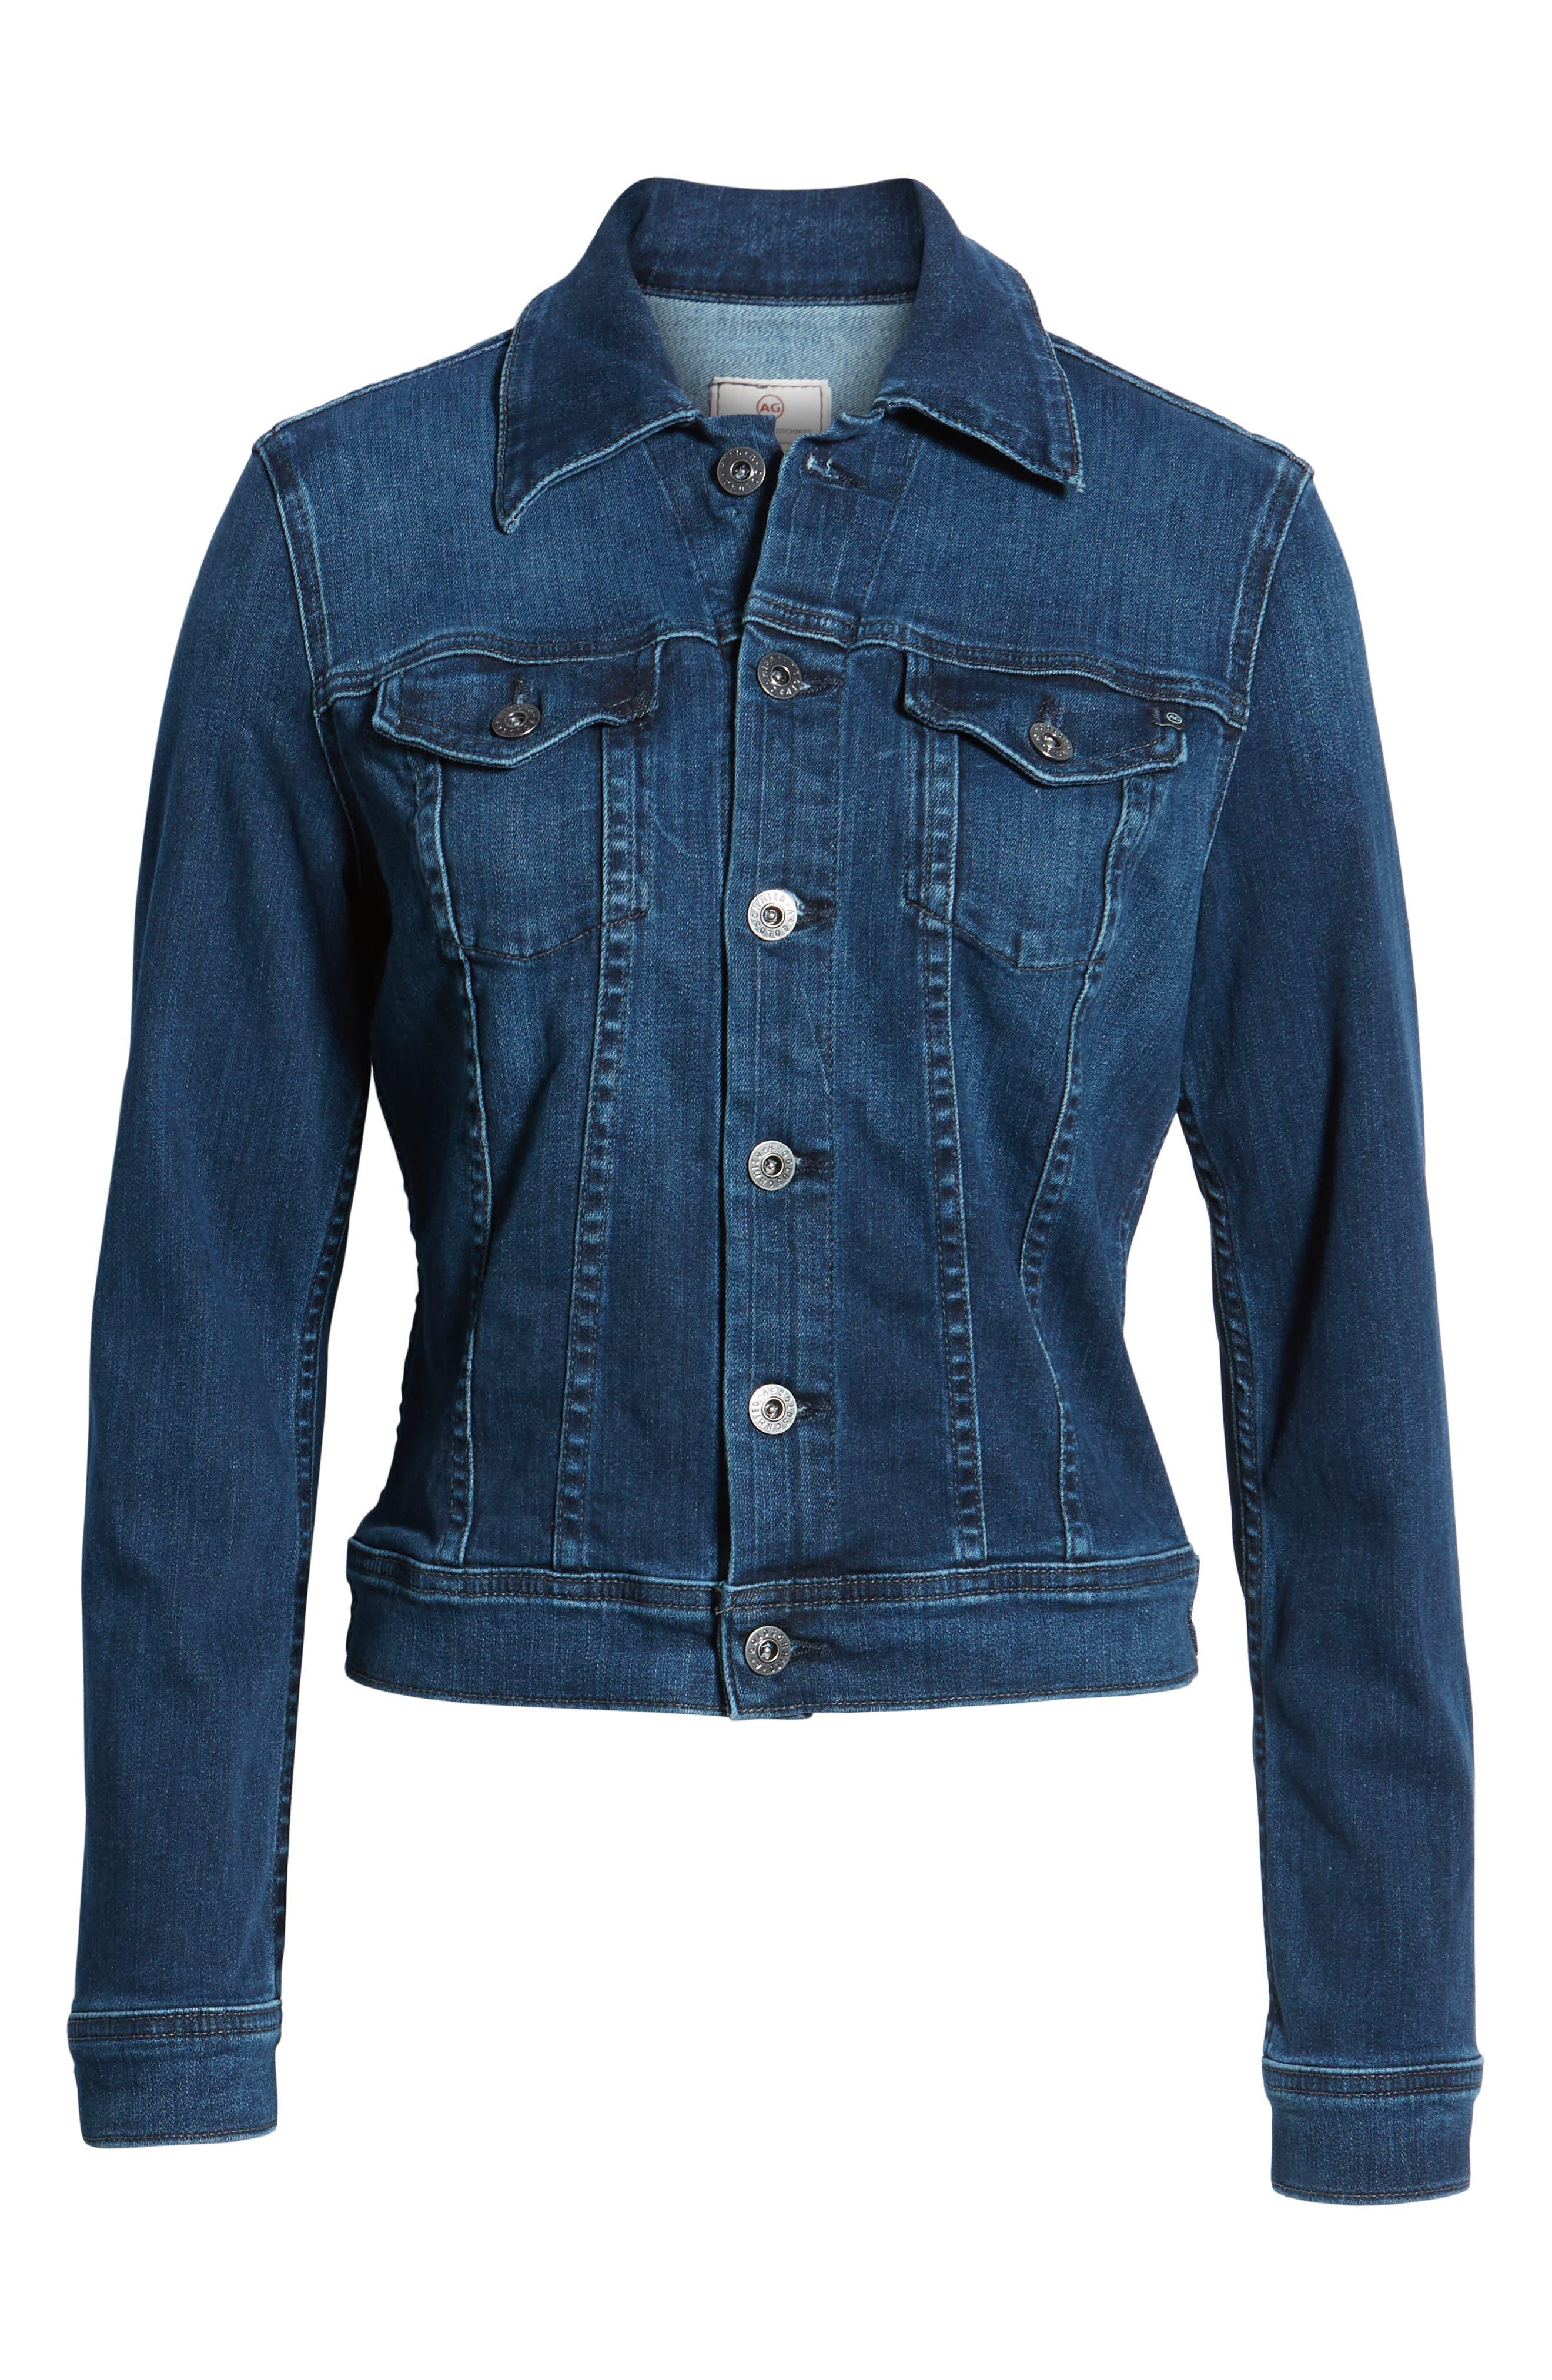 Robyn Crop Denim Jacket,                             Alternate thumbnail 6, color,                             PINNACLE BLUE